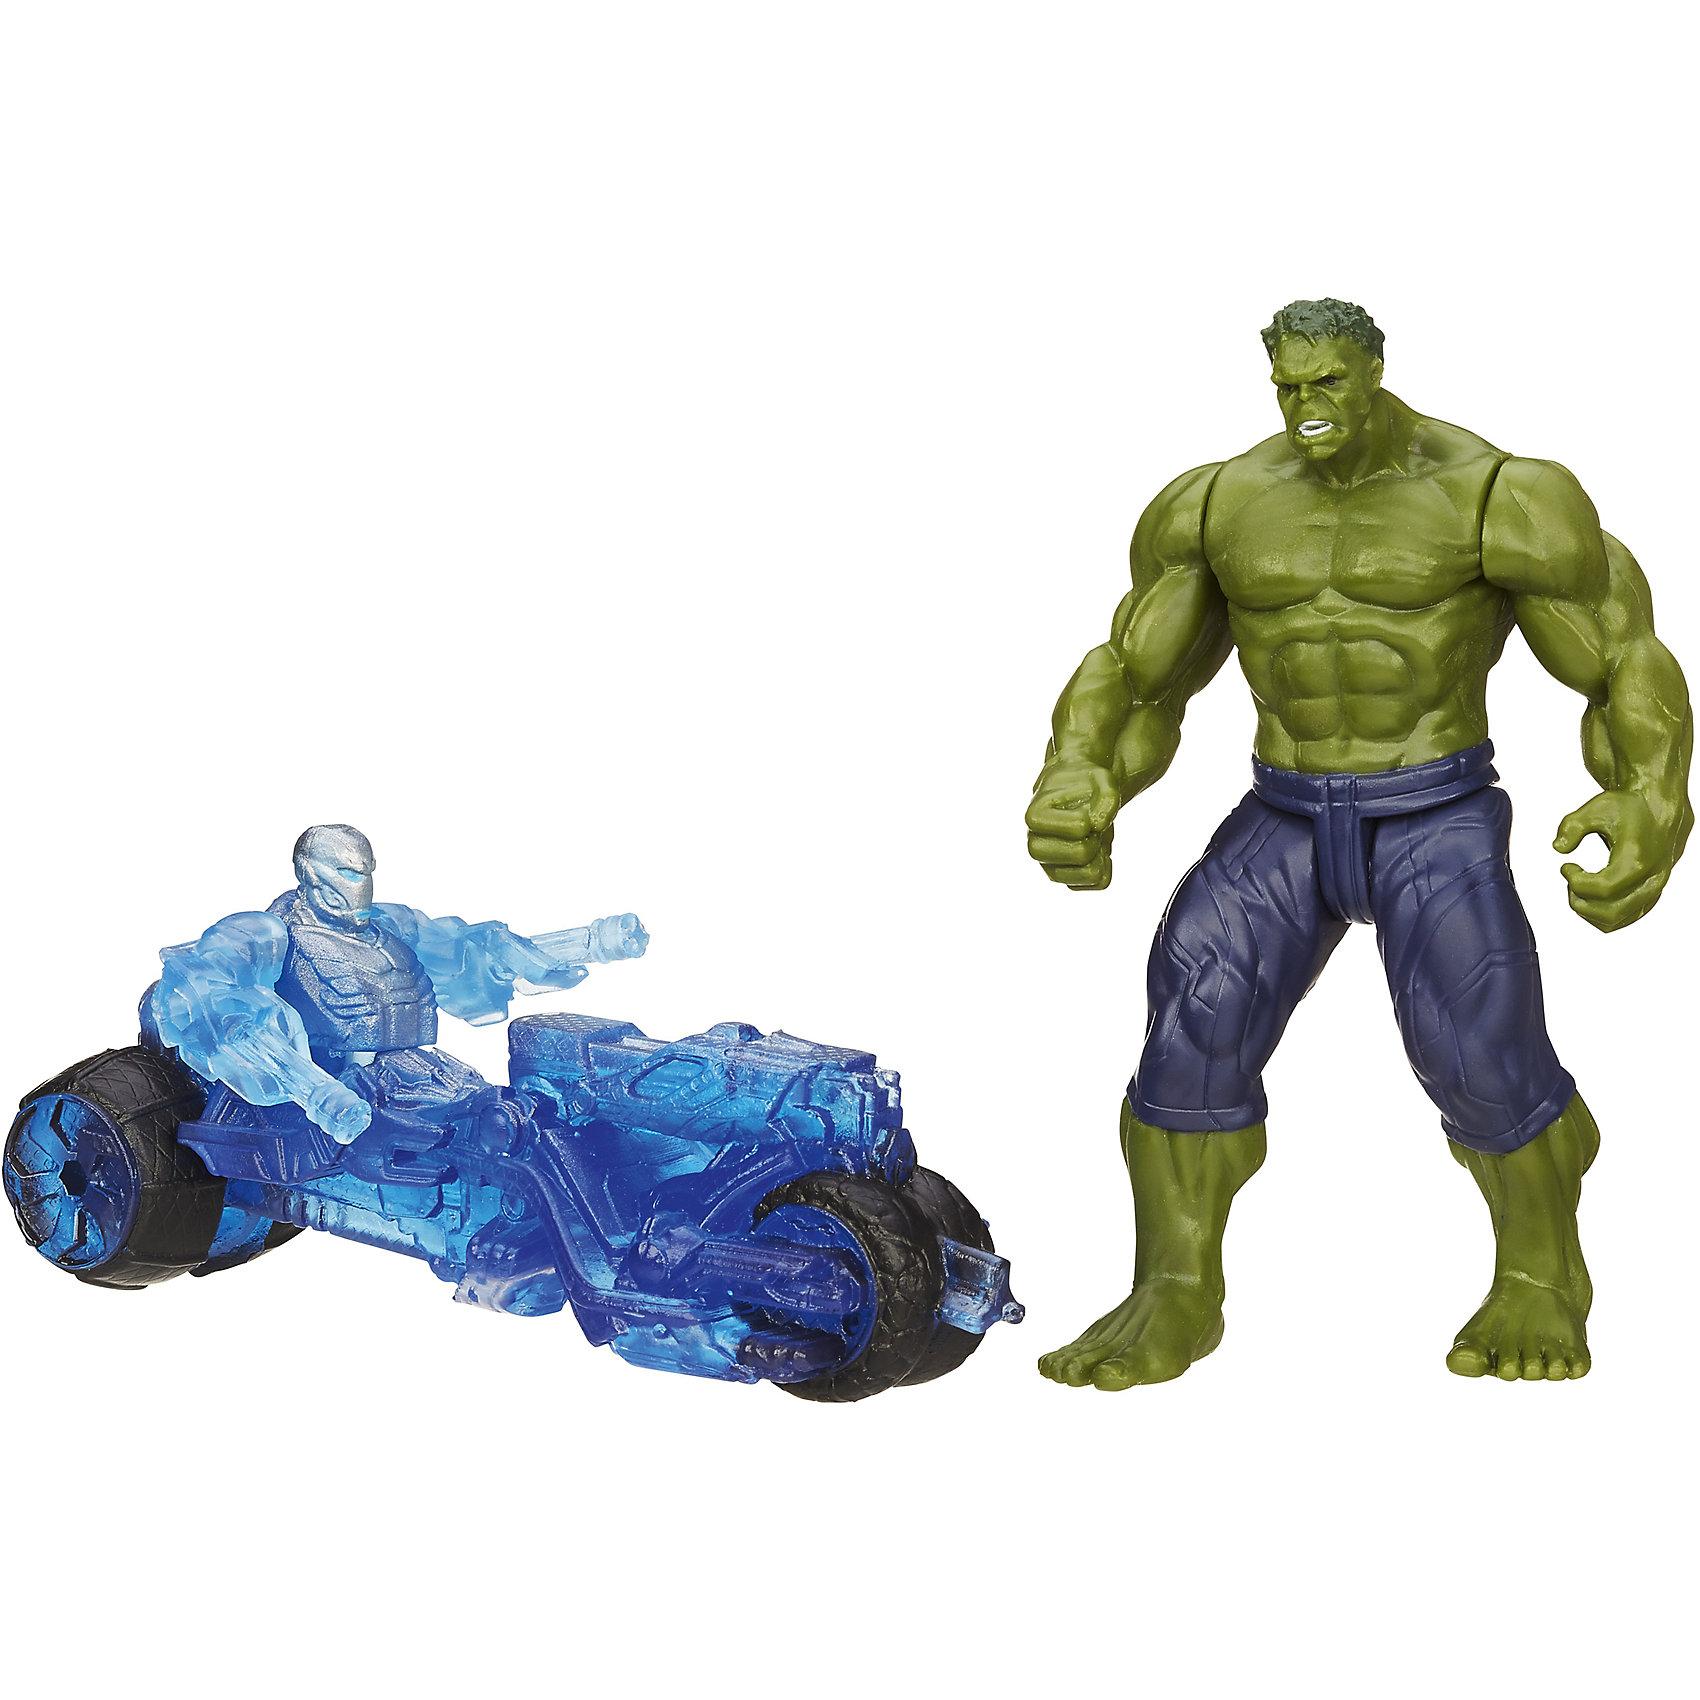 Hasbro Мини-фигурки Мстителей, Marvel Heroes, B0423/B1484